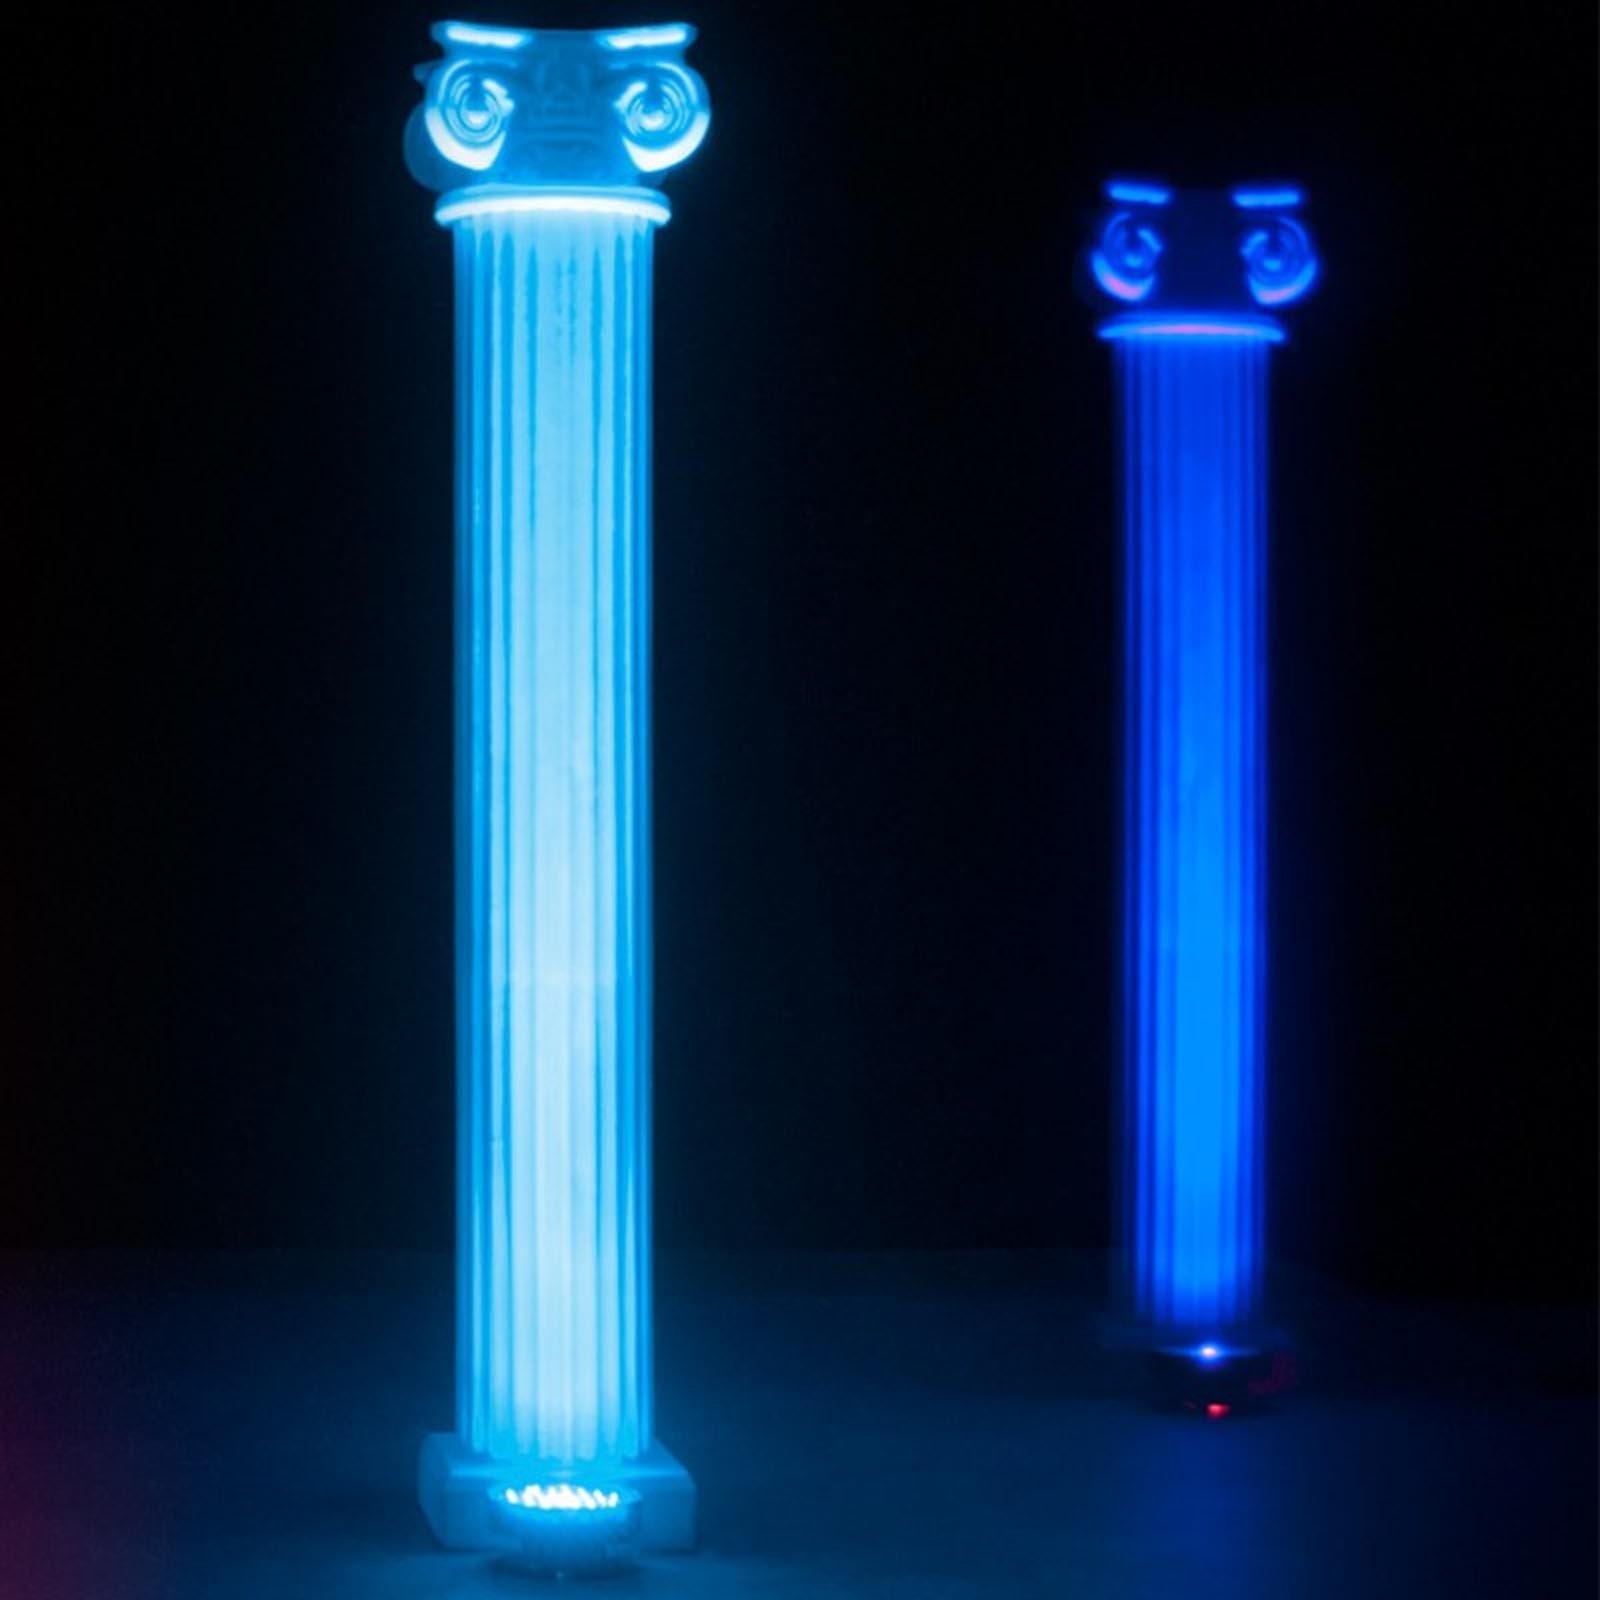 American DJ ADJ Mega Par Profile Plus LED RGB+UV Slim Par Can Wash Effect Light (6 Pack) by ADJ (Image #9)